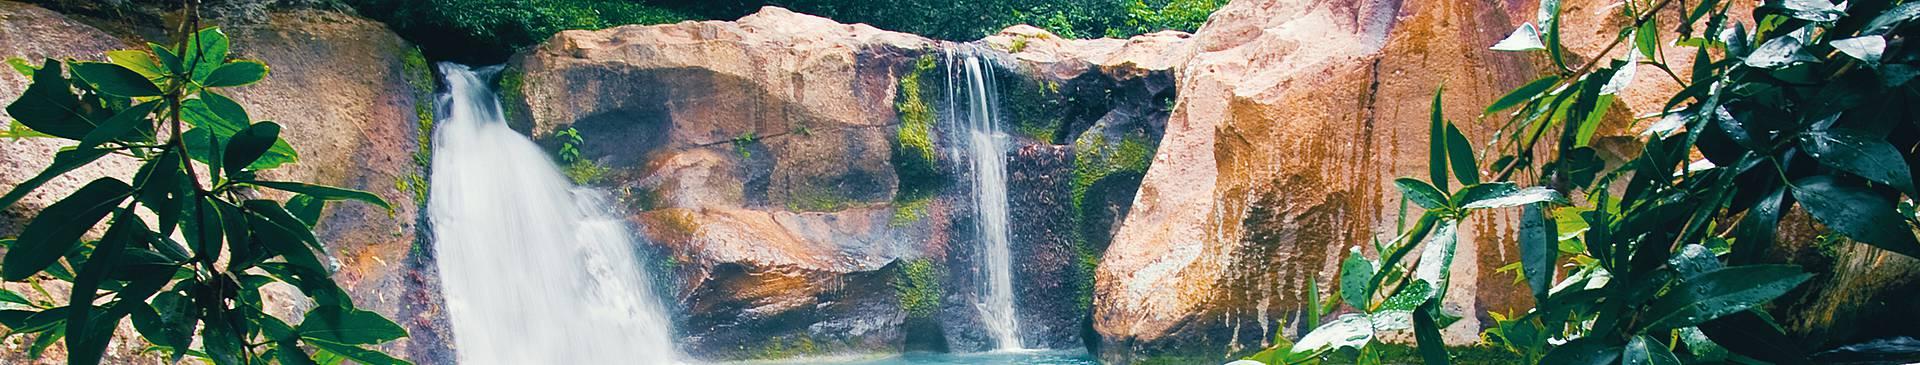 Voyage nature au Costa-Rica